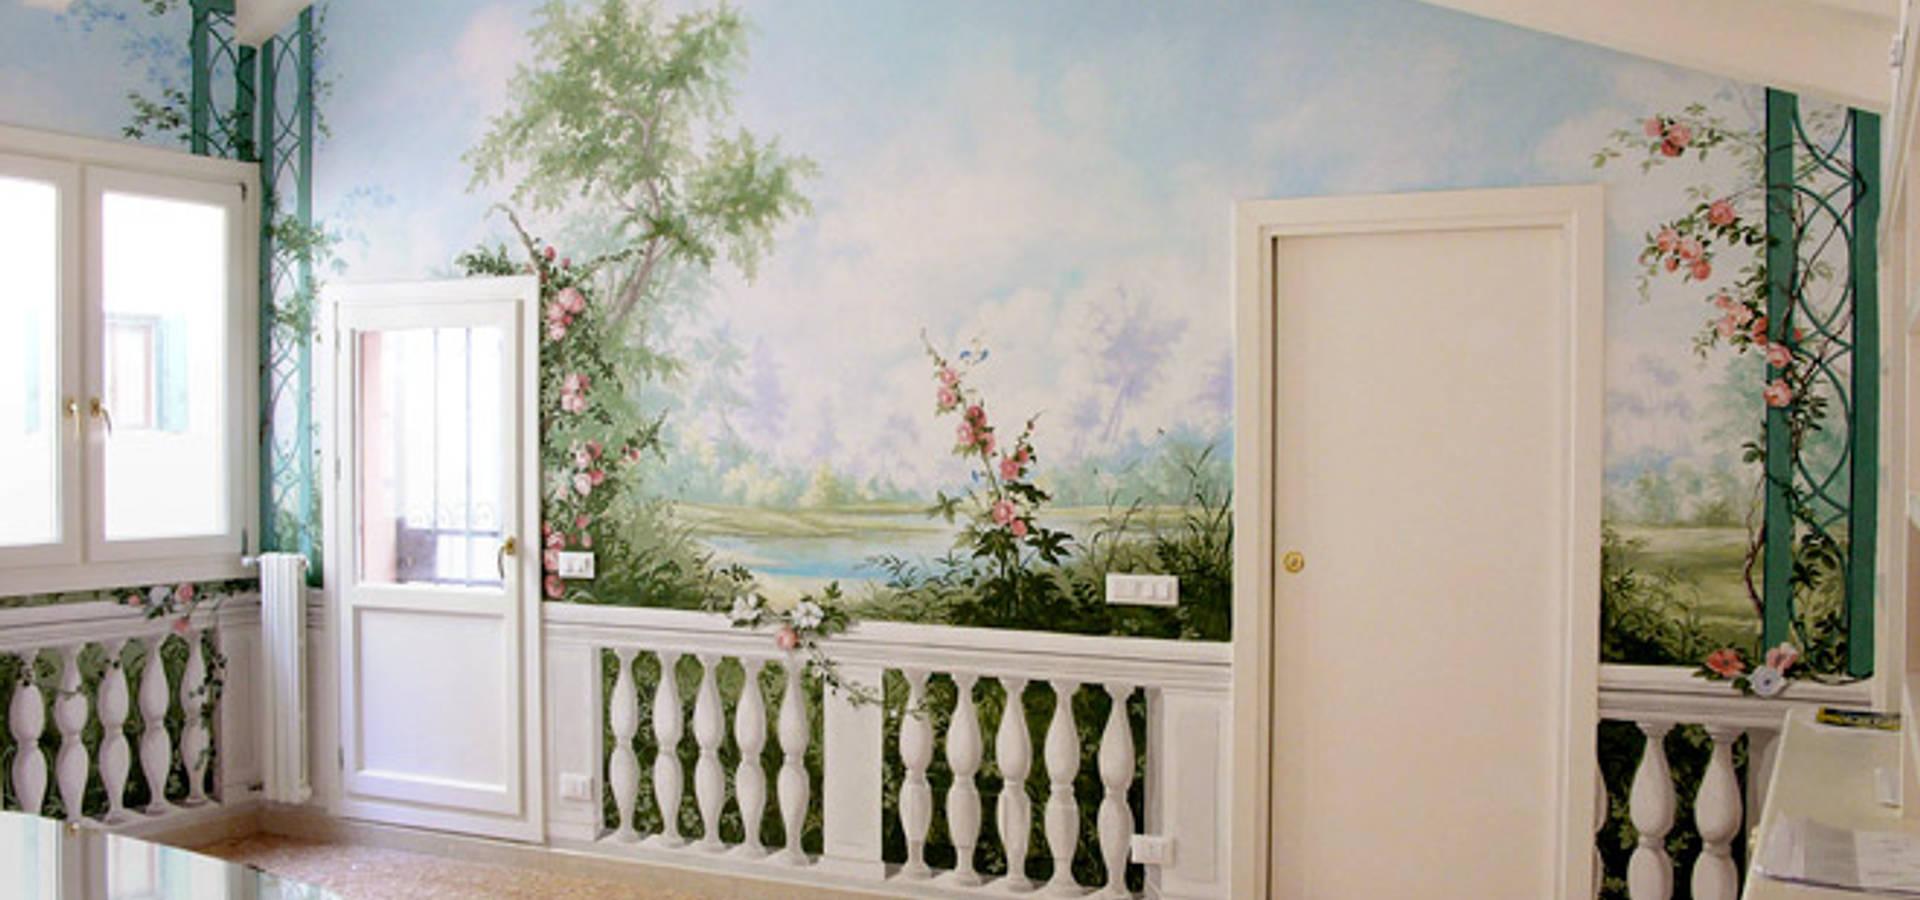 Decorazione di camera da letto von erica de rosa, dipinti, affreschi ...